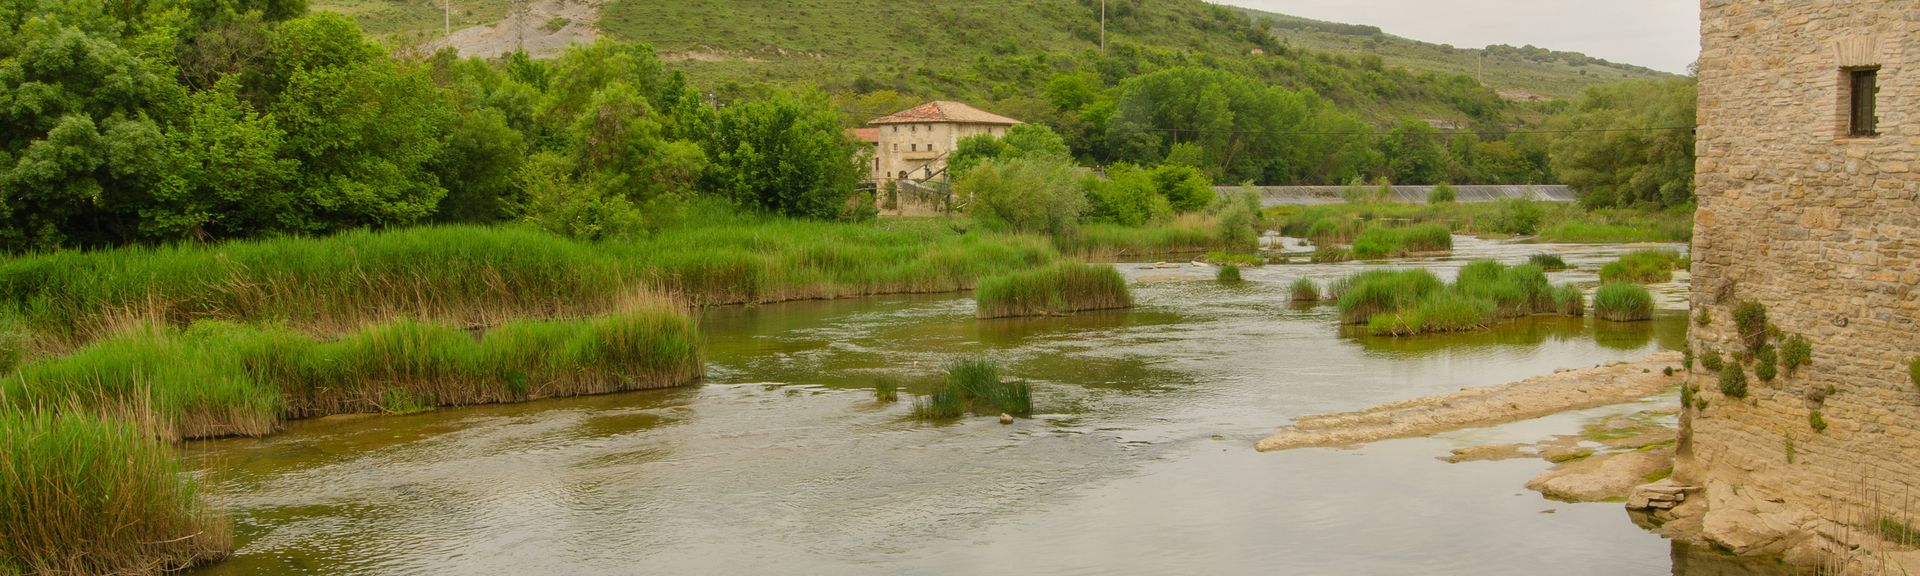 Galar, Navarre, Spanien